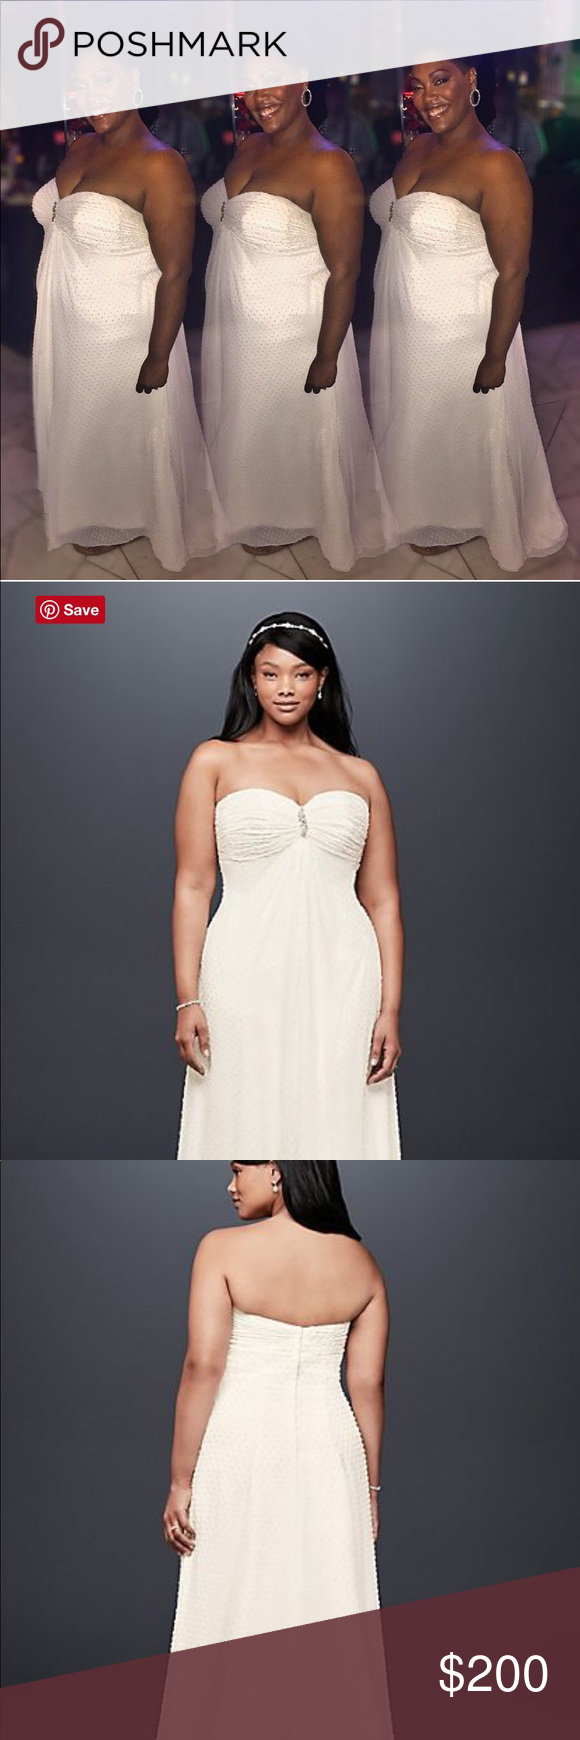 Plus size wedding reception dresses for guests  Davidus Bridal Dotted Chiffon Wedding Gown  Davids bridal dresses